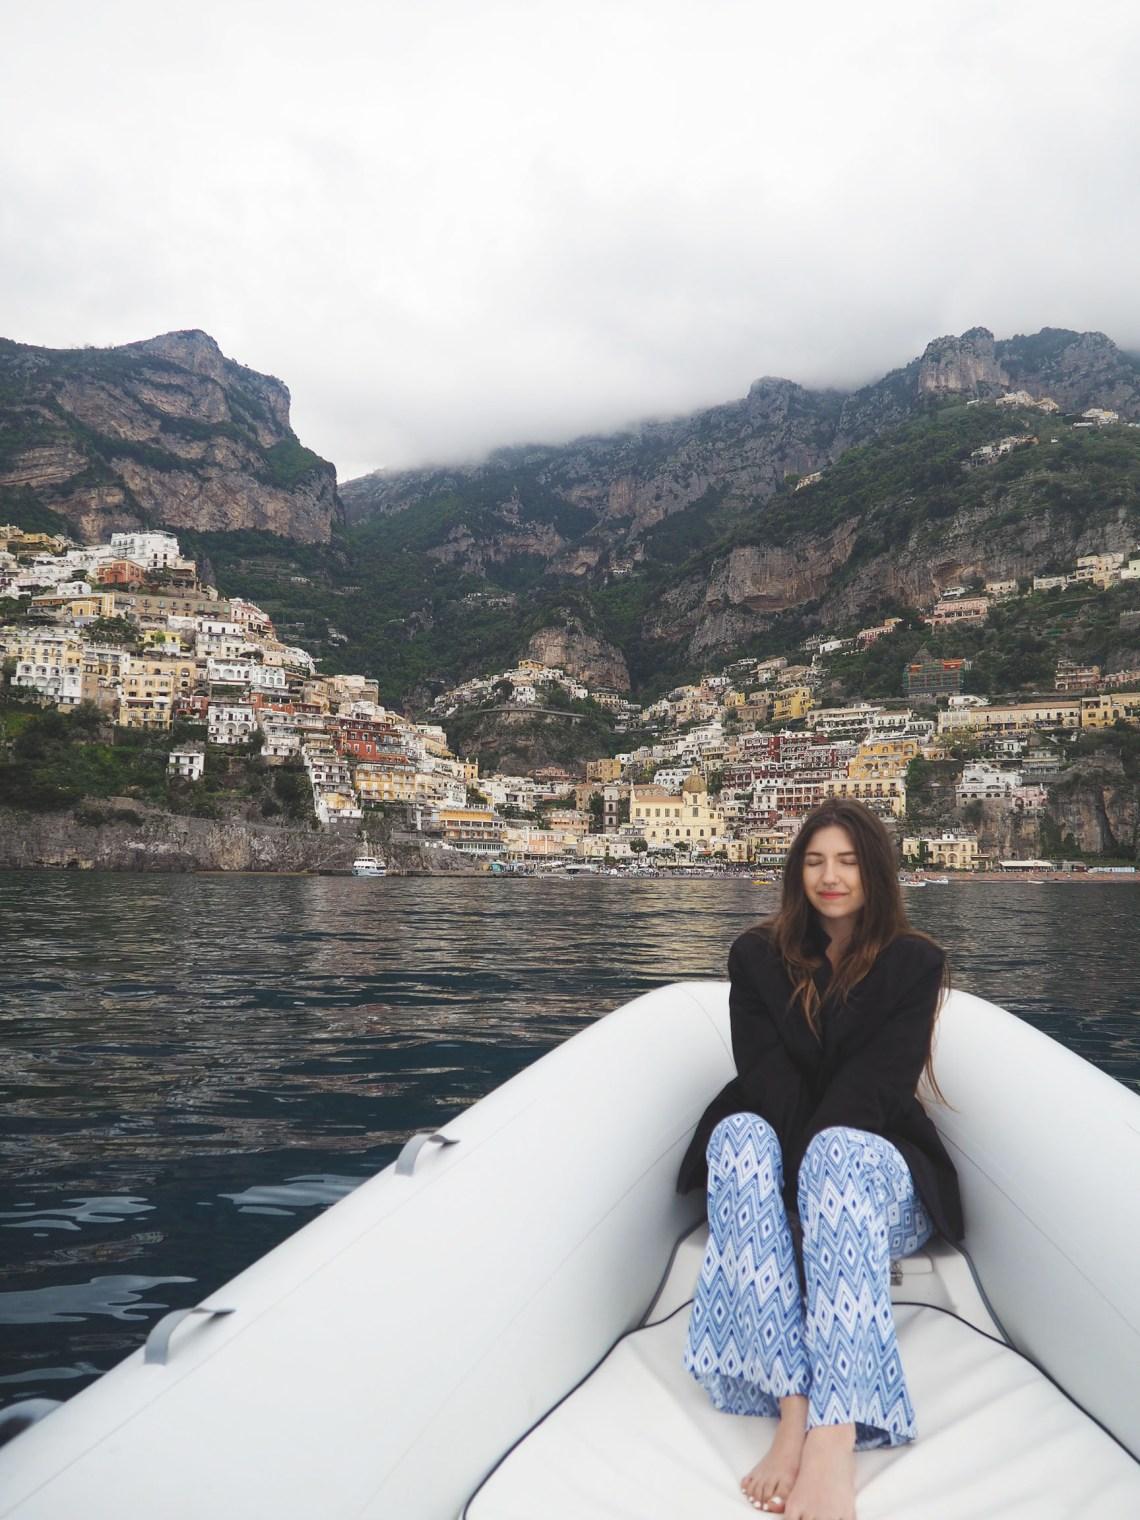 A Romantic Getawayin Positano